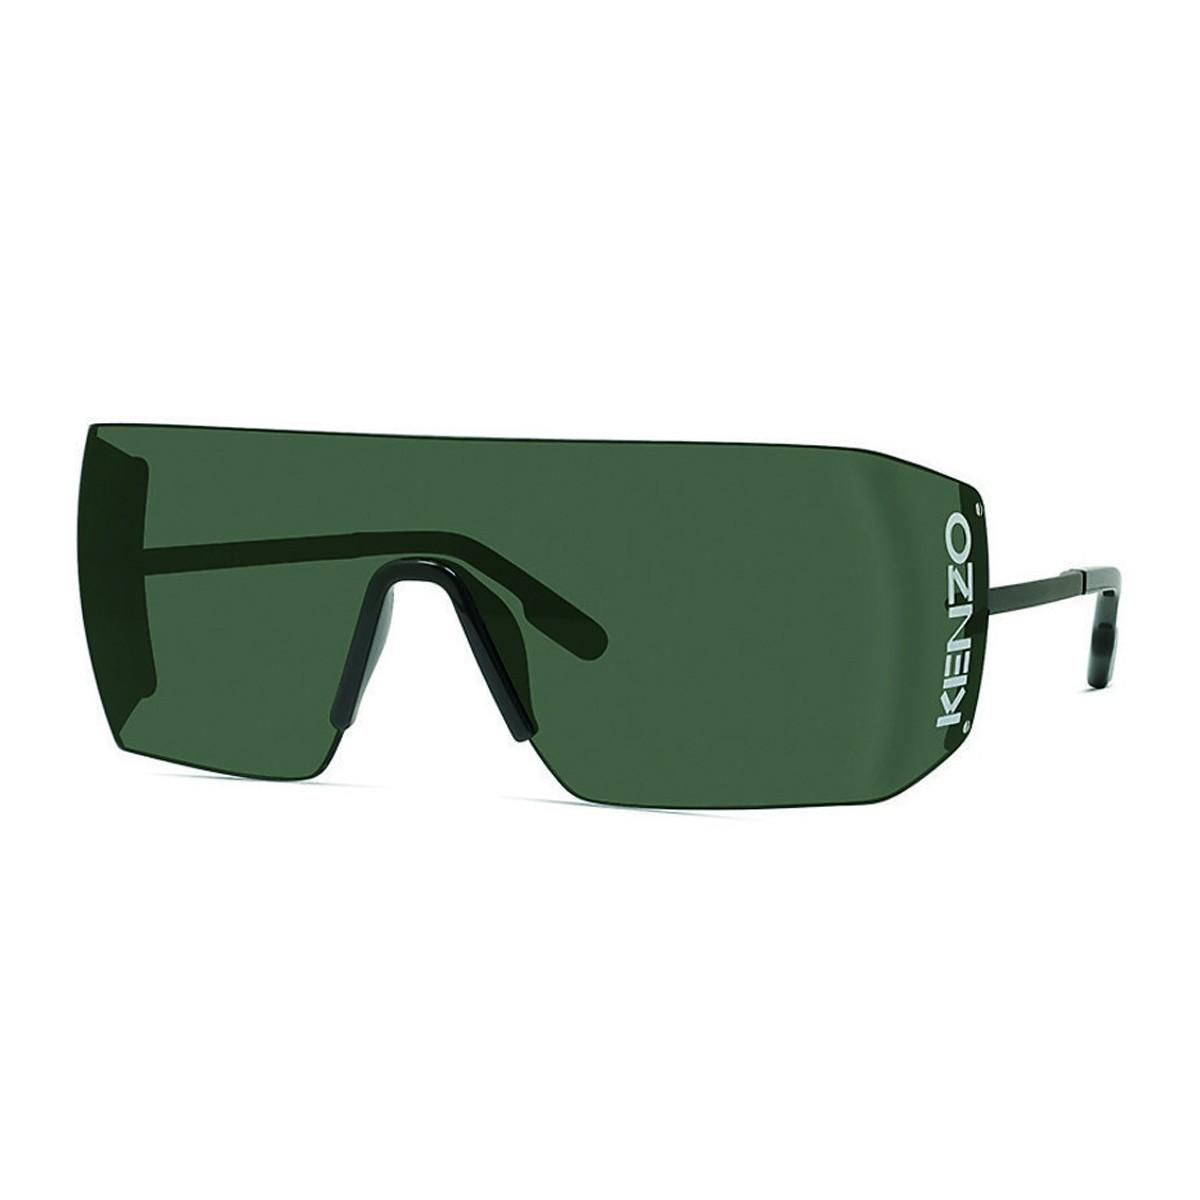 Kenzo KZ40061I   Unisex sunglasses